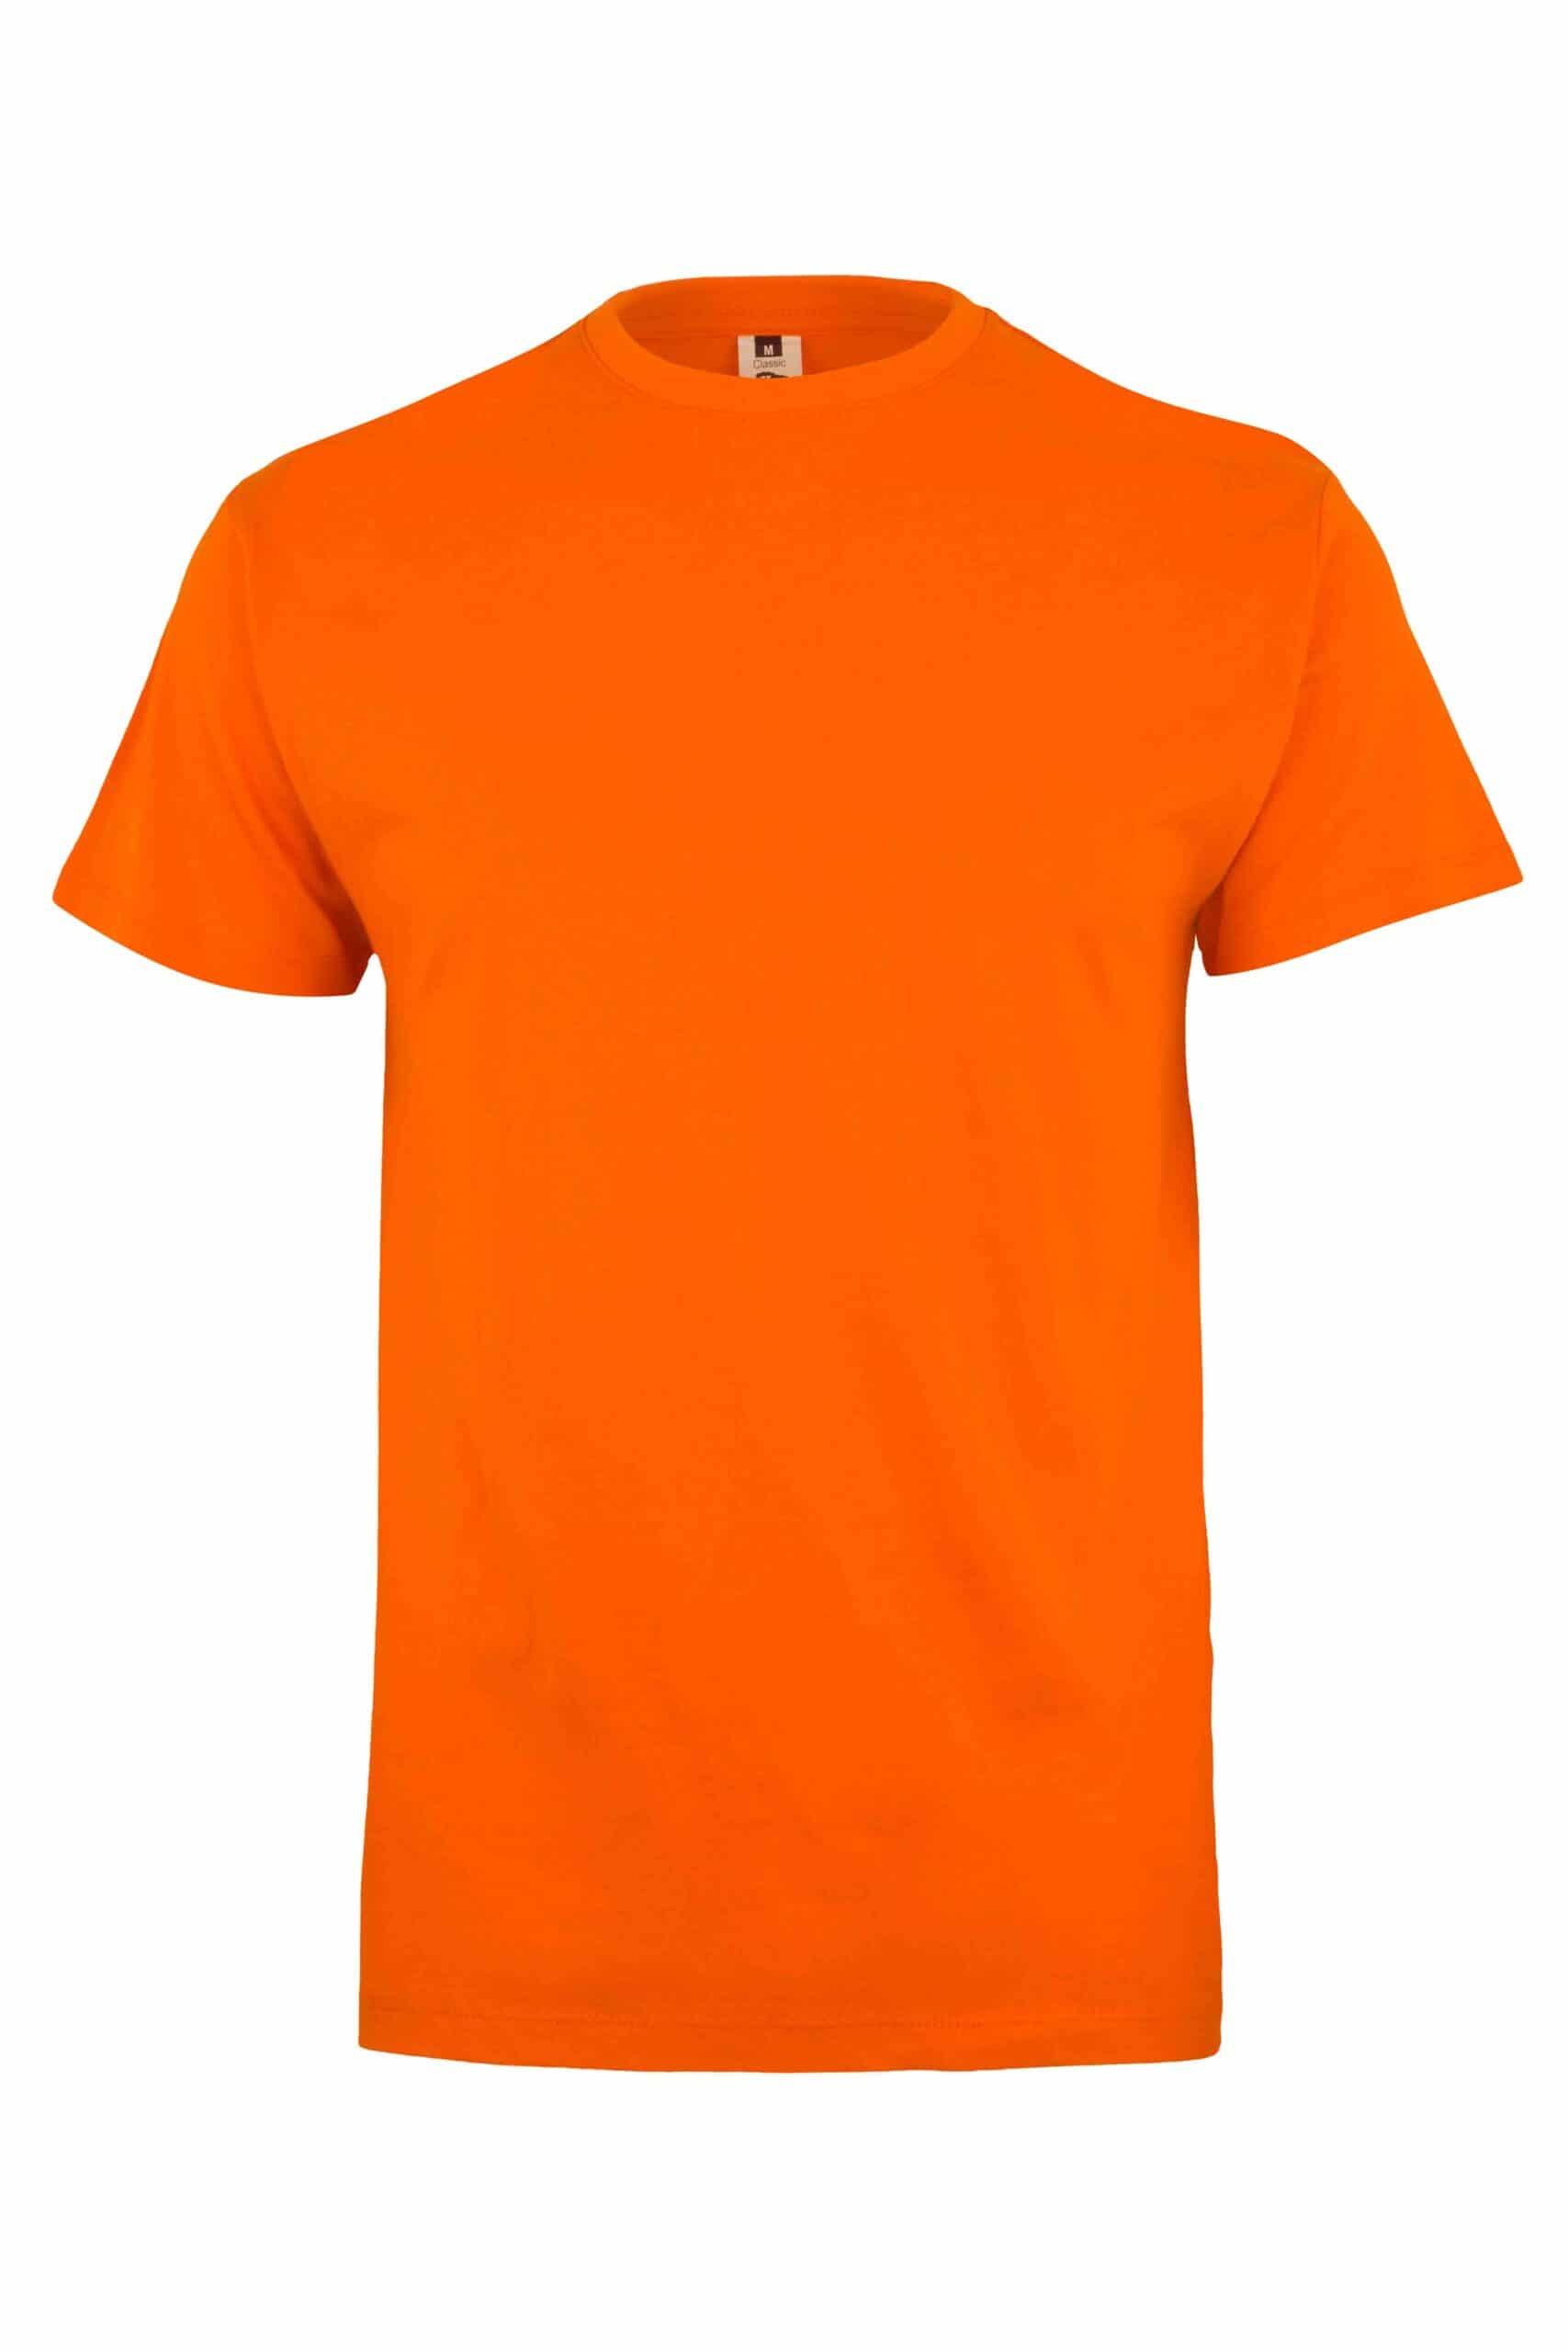 Mukua Mk022cv Camiseta Manga Corta 150gr Orange